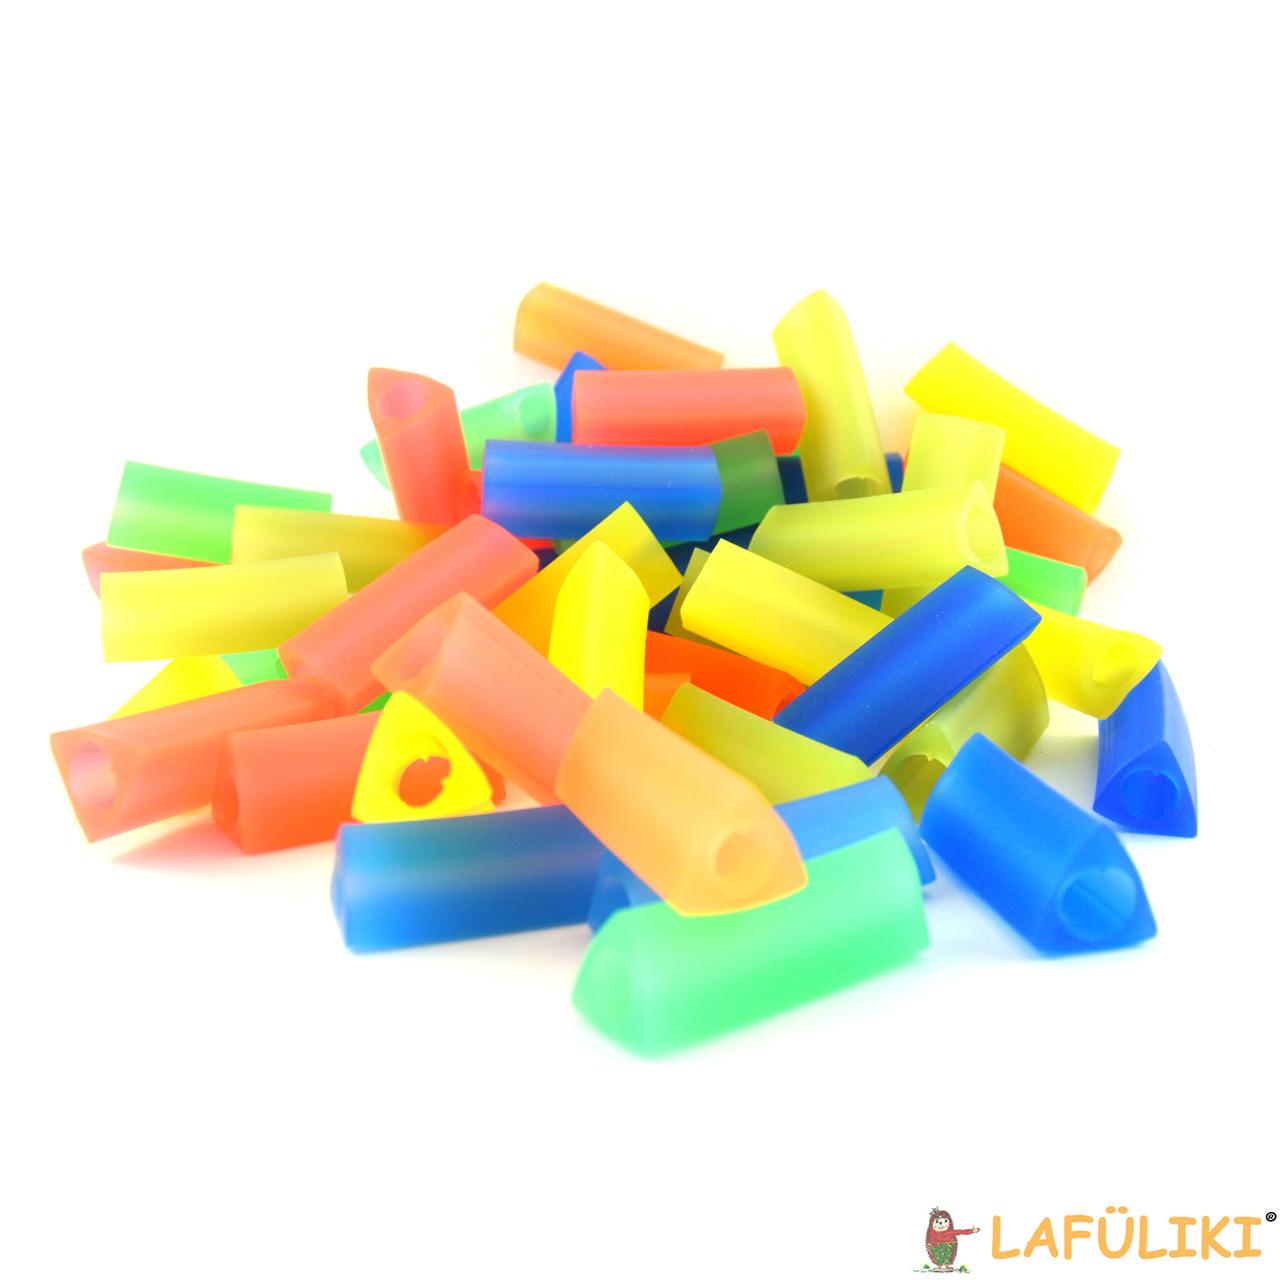 Schreibhilfe-Dreikant-klein-gross-6302-Set-50_Stueck-lose-lafueliki